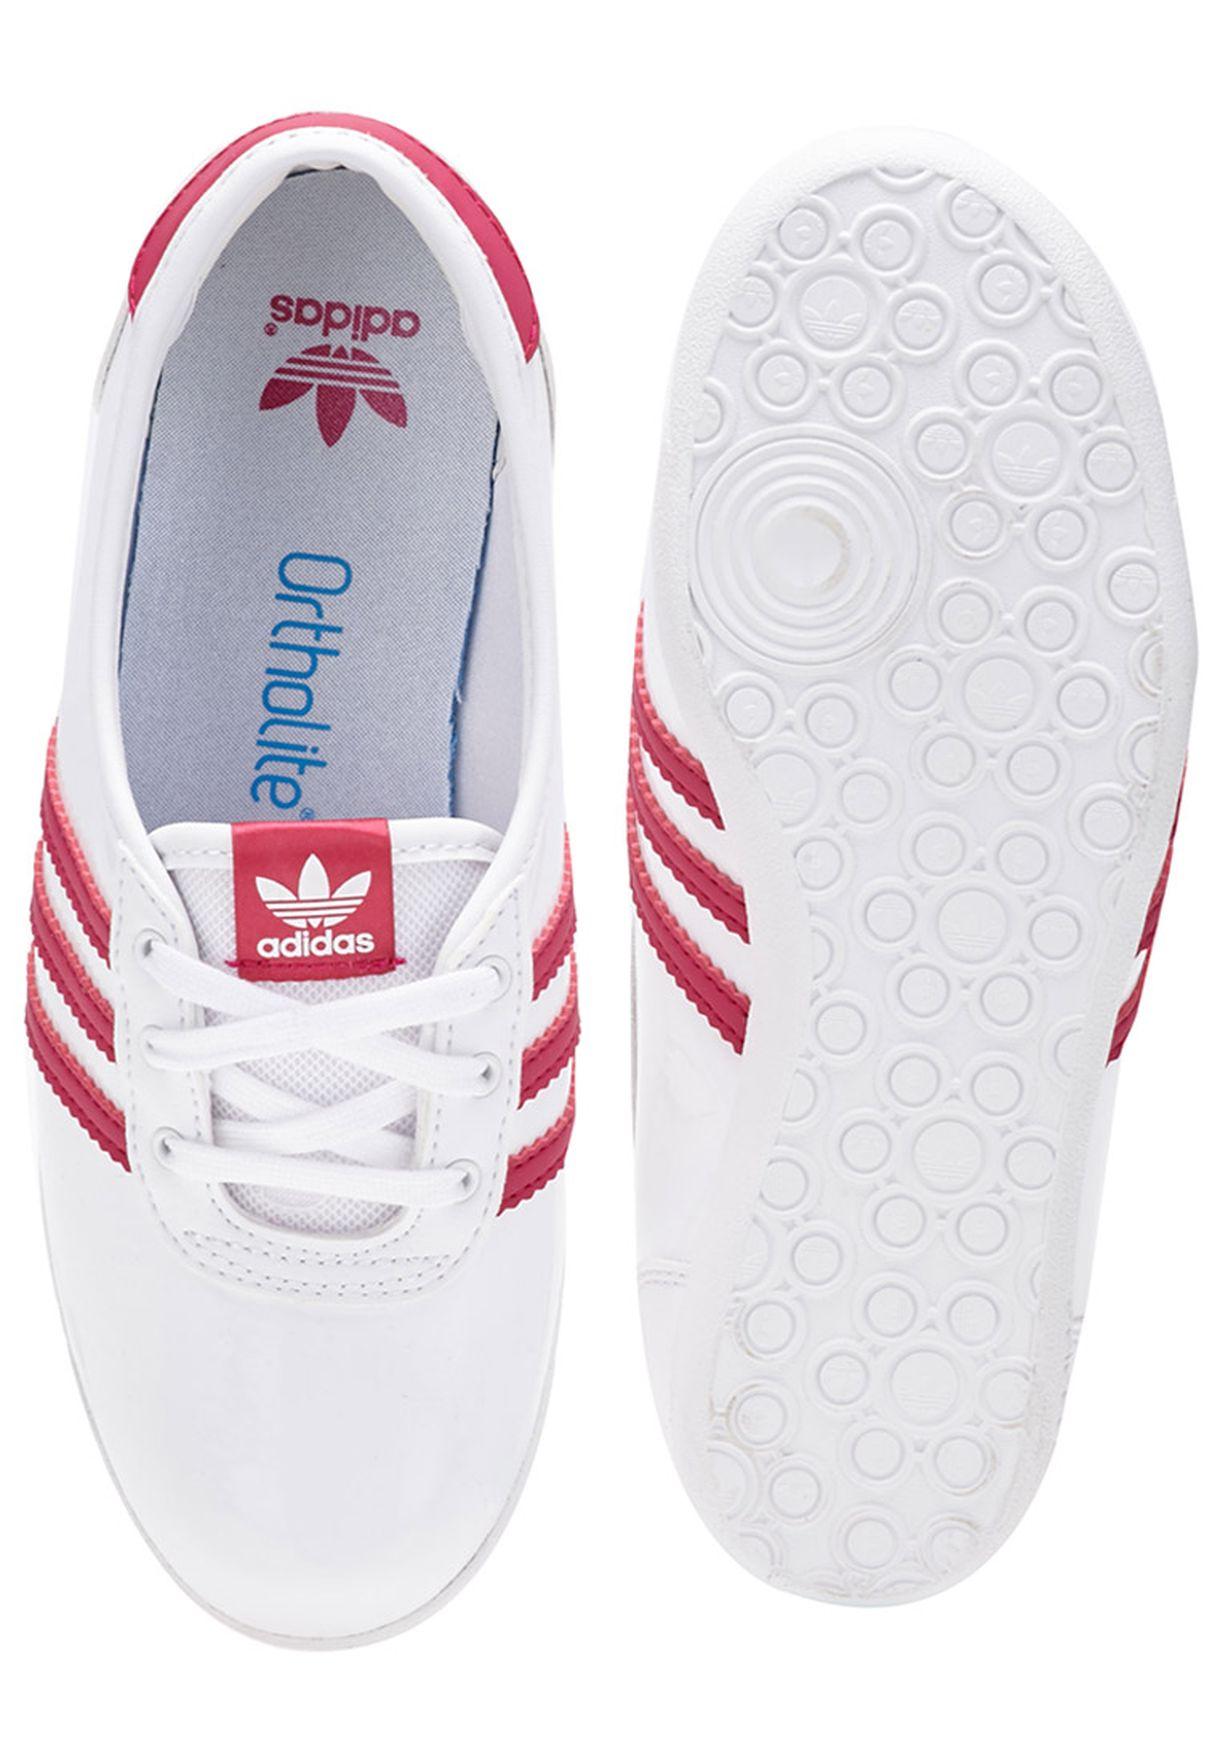 fe56f24d1e5 Shop adidas Originals white Forum Slipper 2.0 Youth B25032 for Kids ...